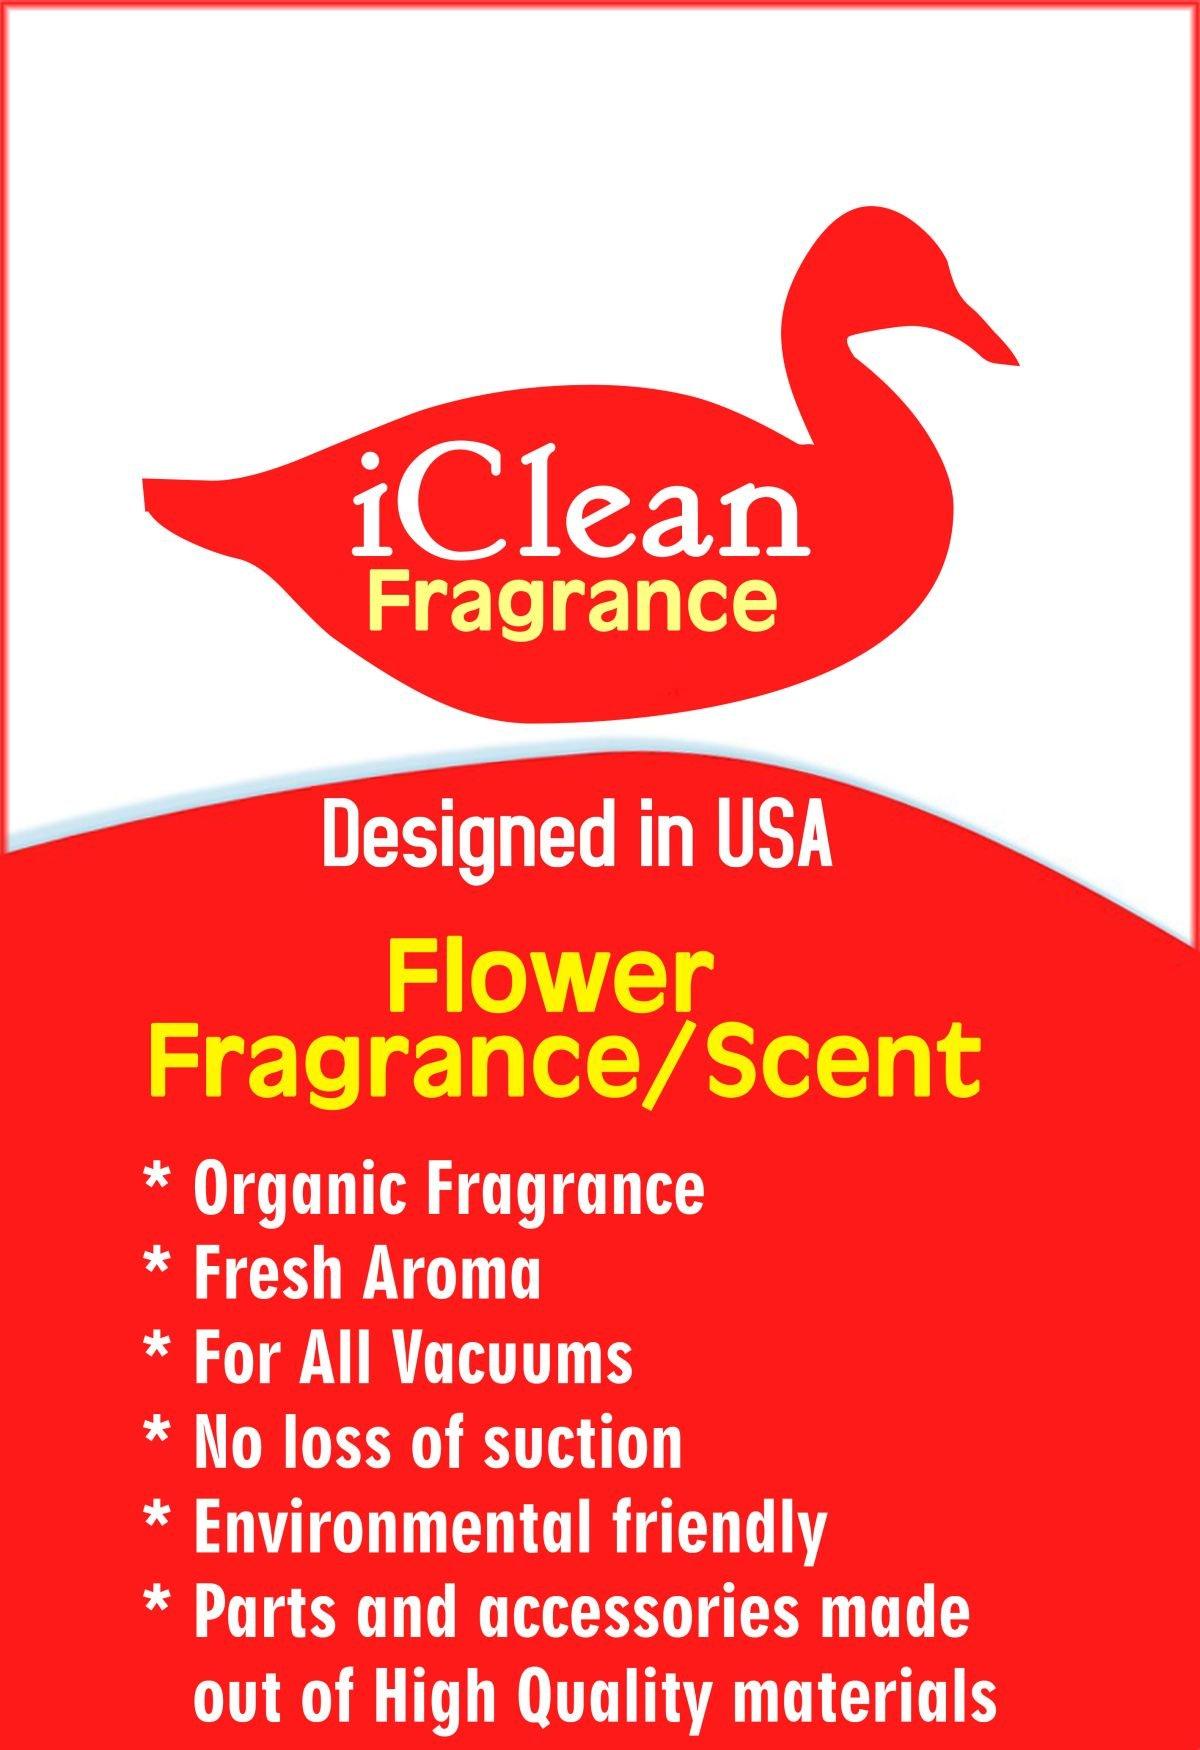 Vacuum Air Freshener Sticks Flower Fragrance/Scent 6Pk By iClean Fragrance